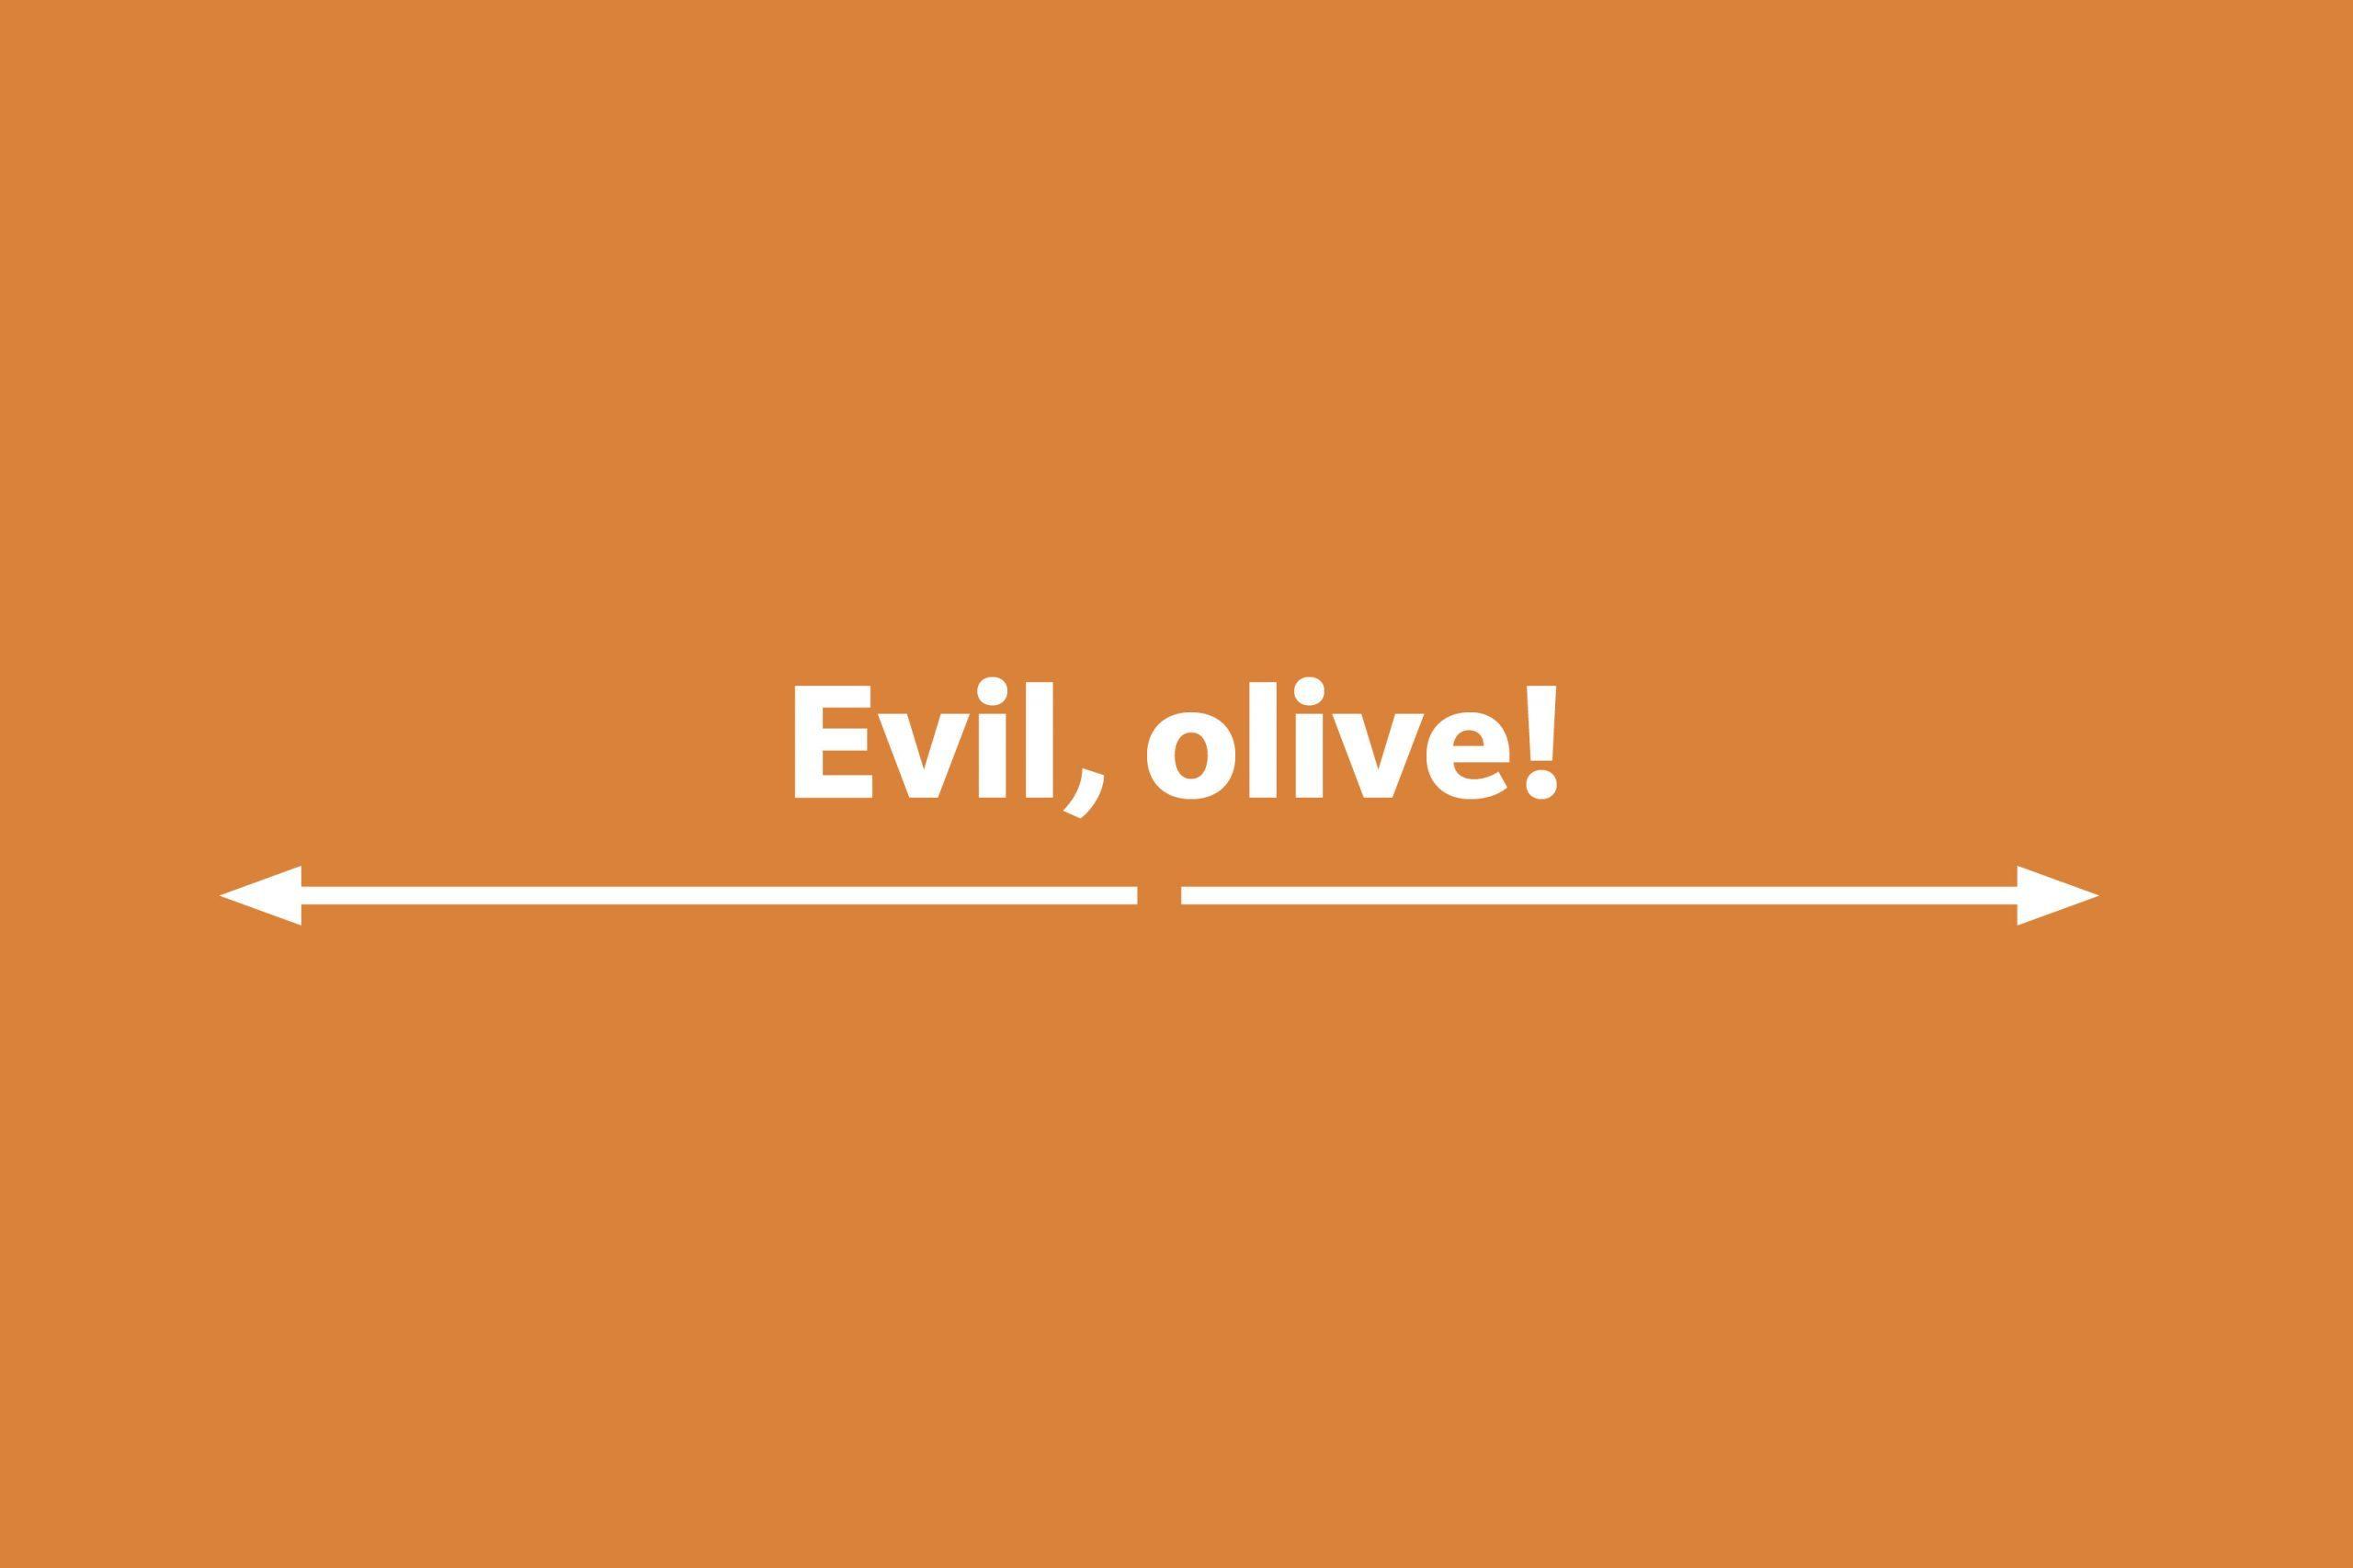 Evil, olive!